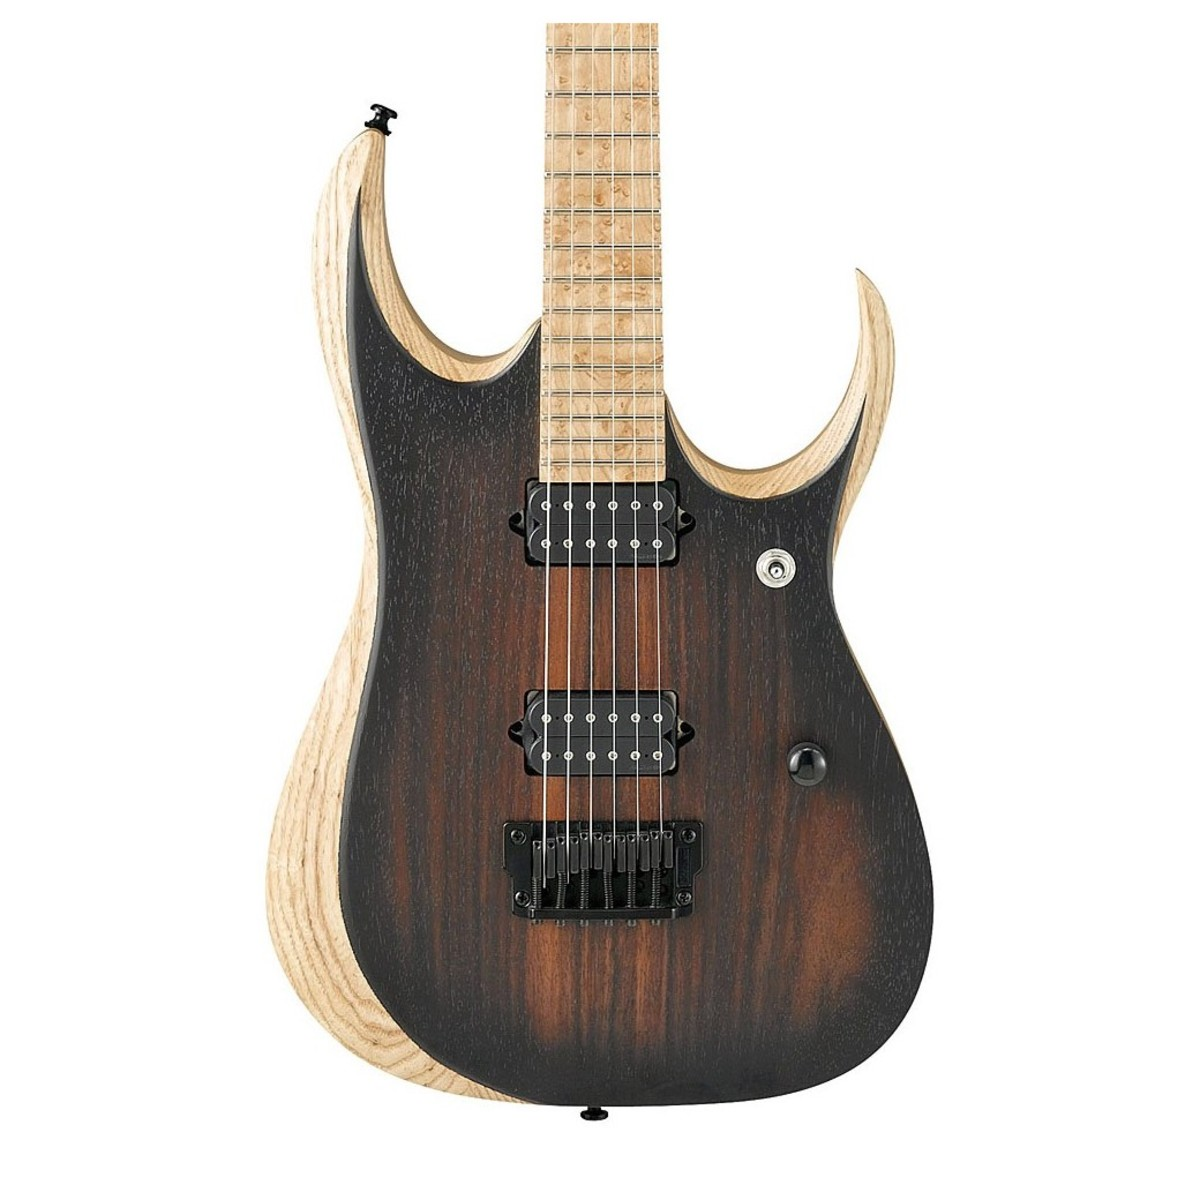 Ibanez Iron Label : ibanez iron label rgdix6mrw electric guitar charcoal brown at ~ Vivirlamusica.com Haus und Dekorationen